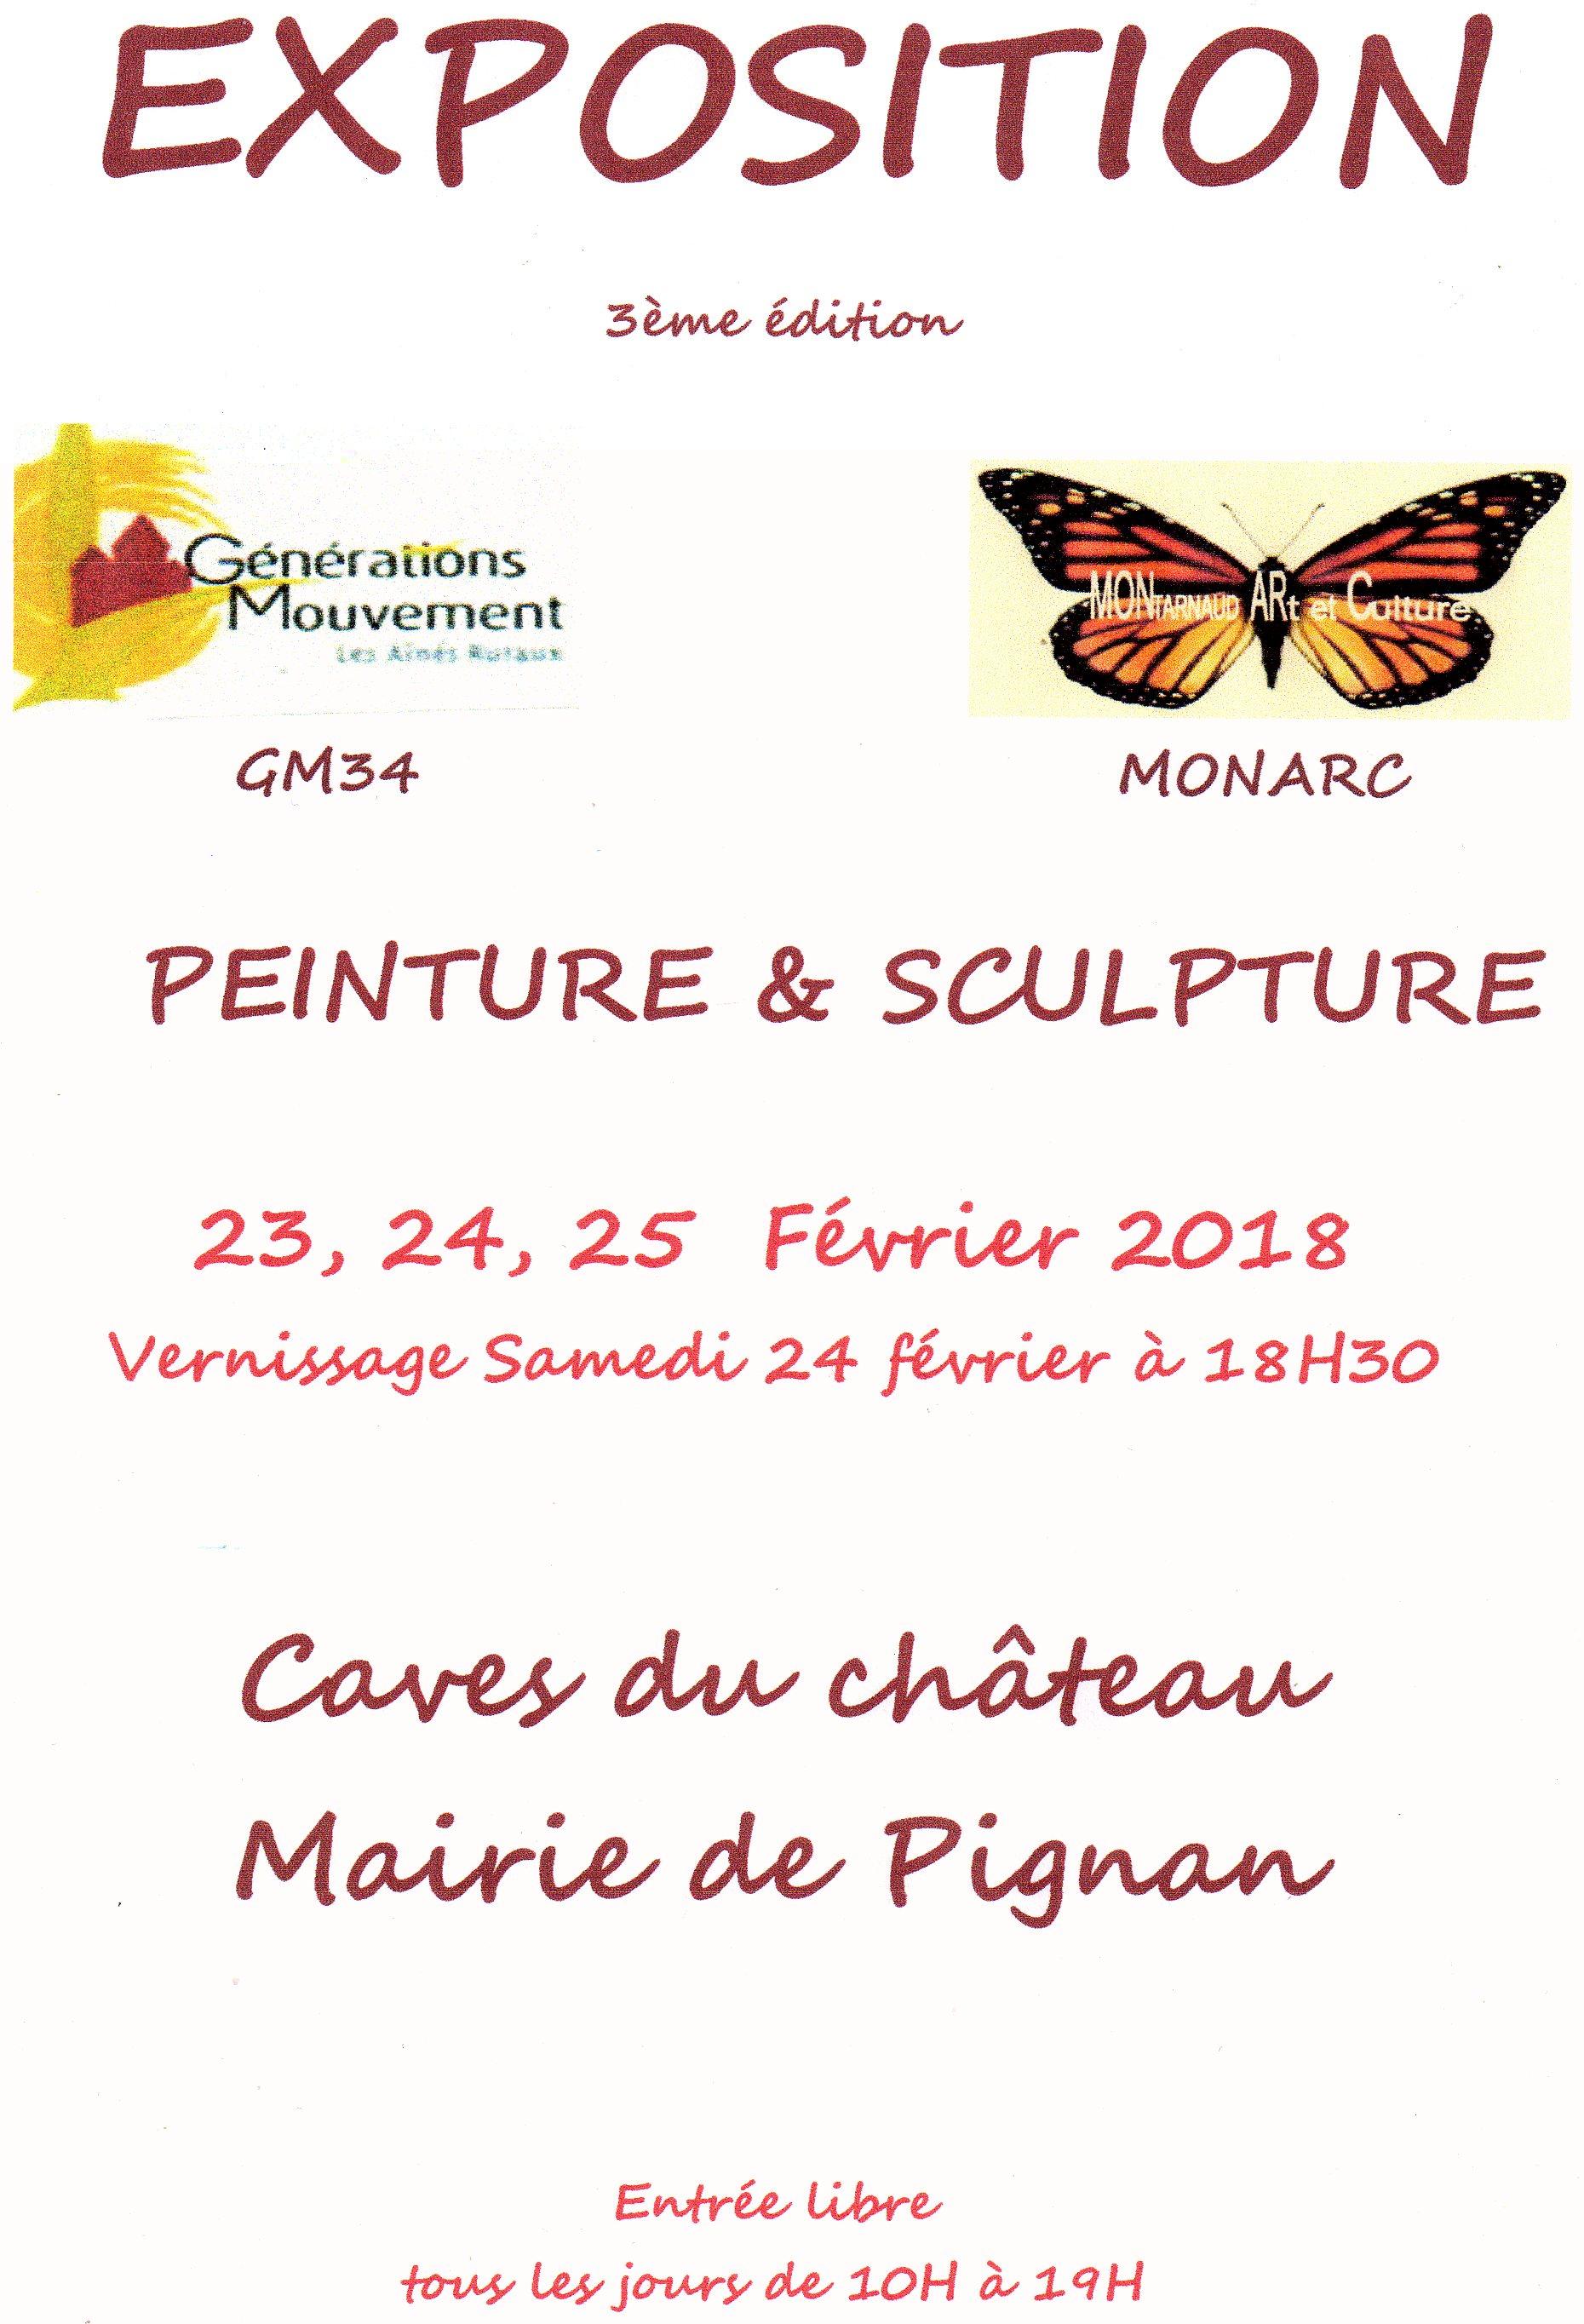 Exposition Pignan